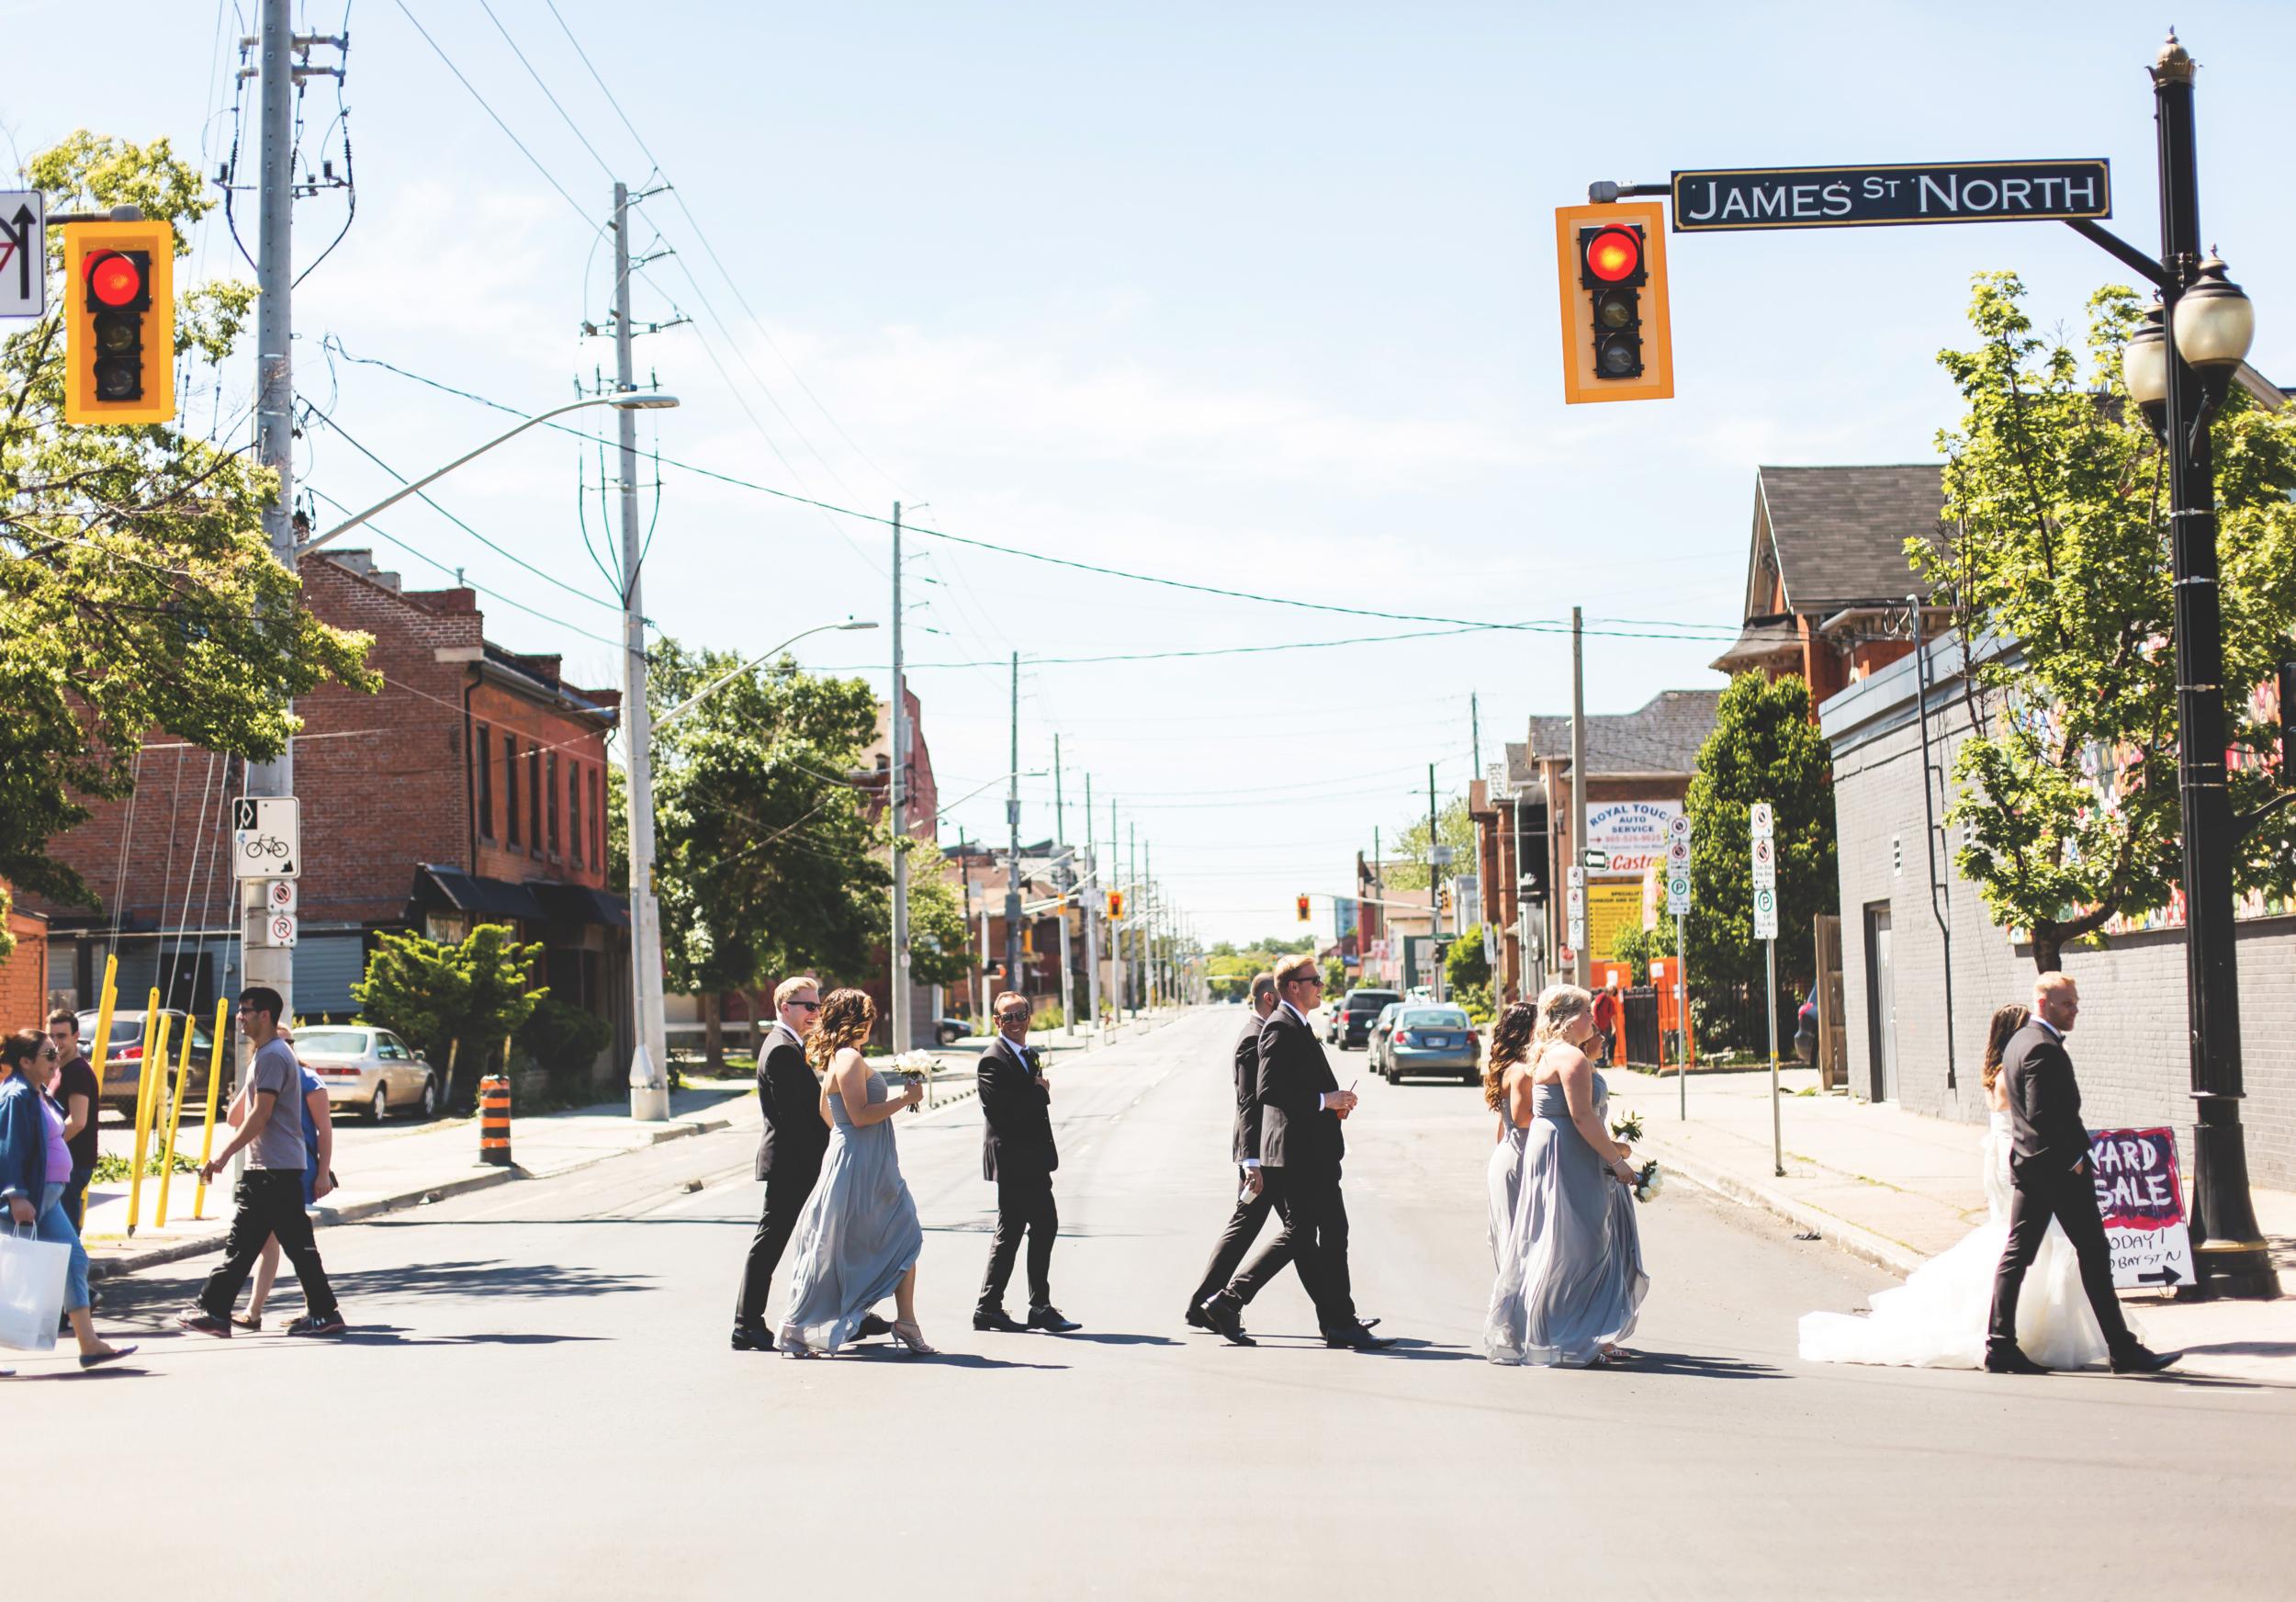 Wedding-Harbour-Banquet-Center-Oakville-Photographer-Wedding-Hamilton-Saint-James-Espresso-Downtown-HamOnt-GTA-Niagara-Toronto-Moments-by-Lauren-Photography-Photo-Image-40.png